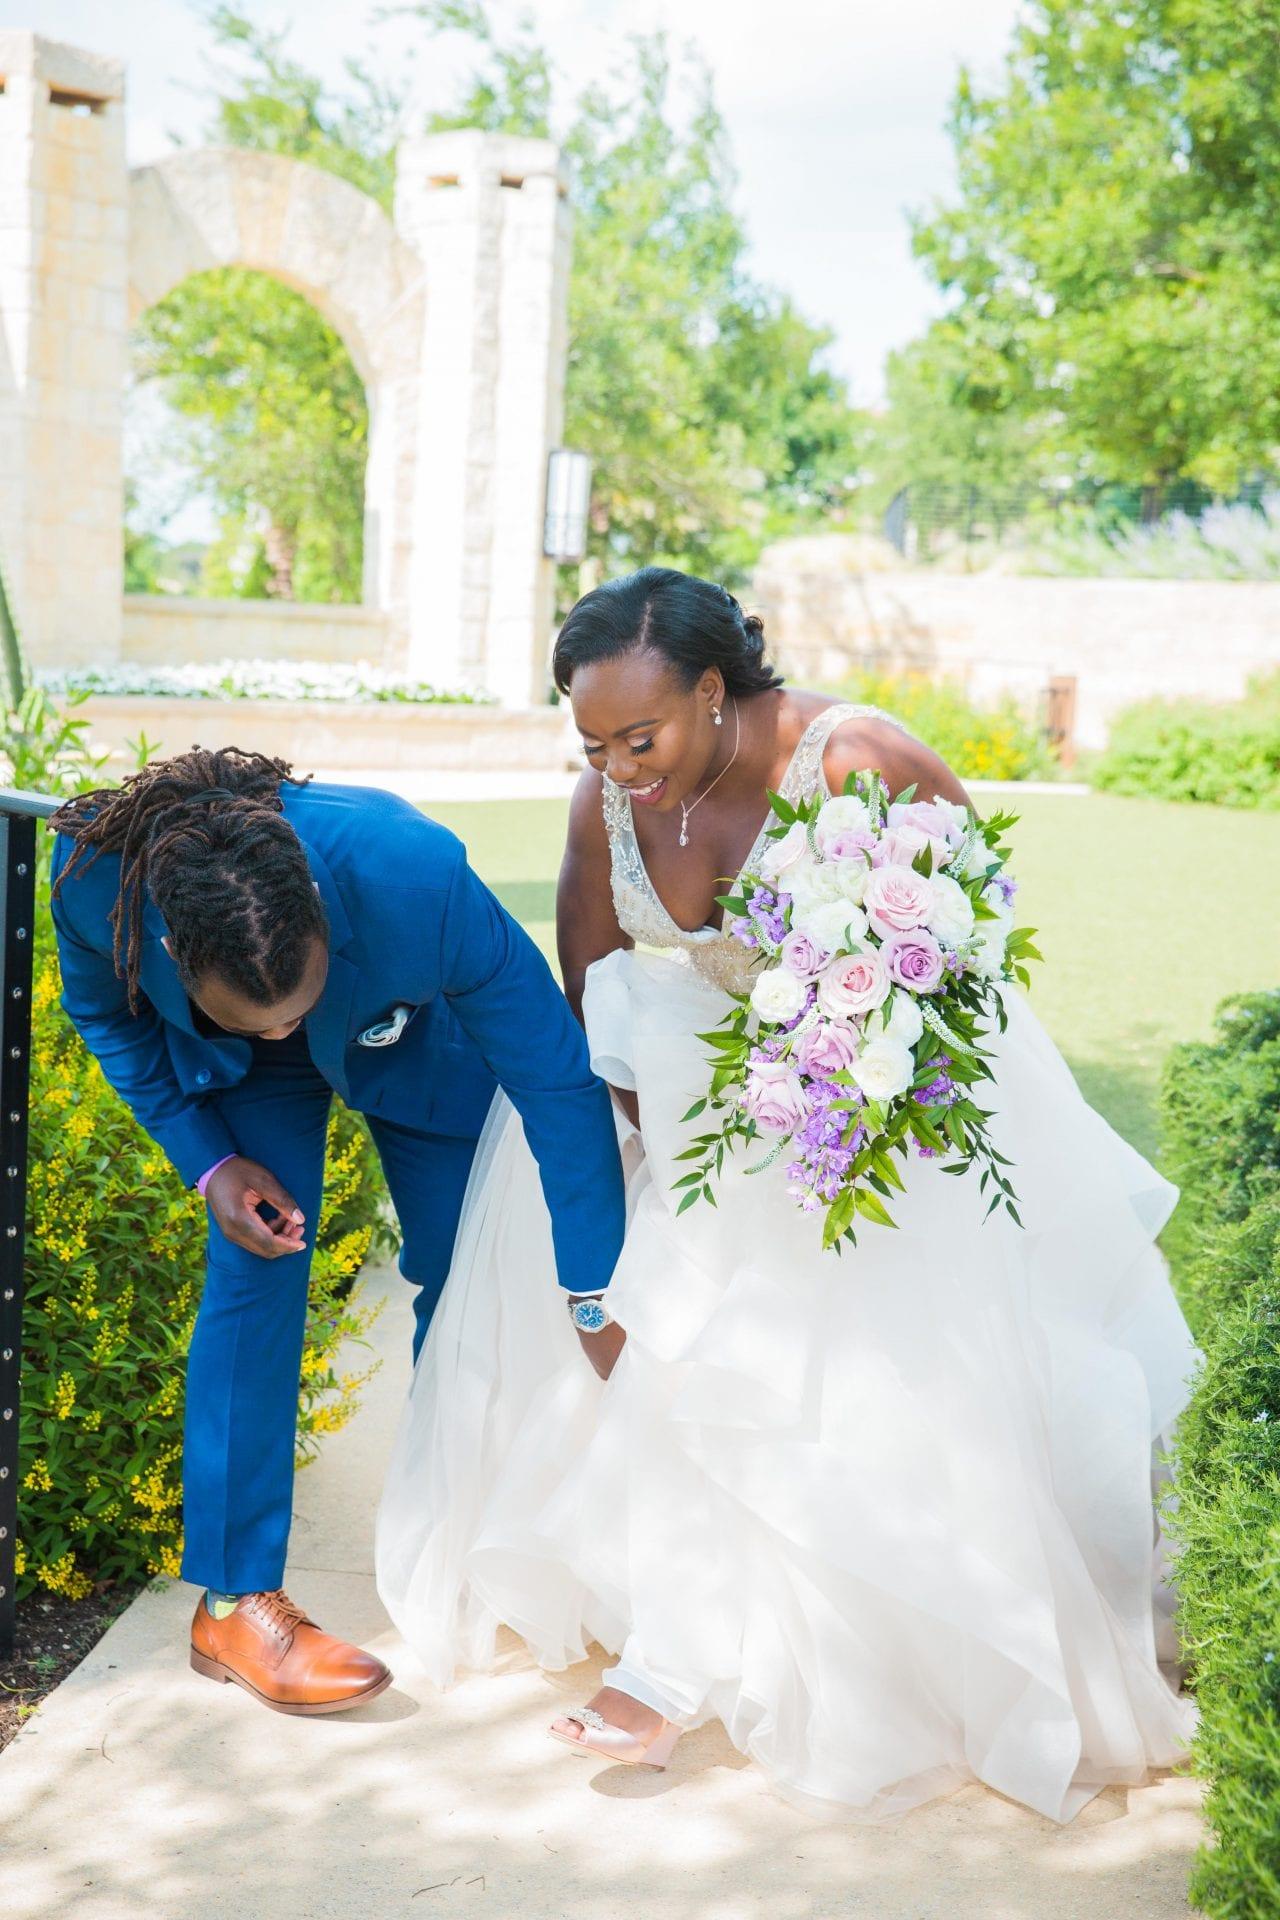 Onyema wedding La Cantera first look shoes